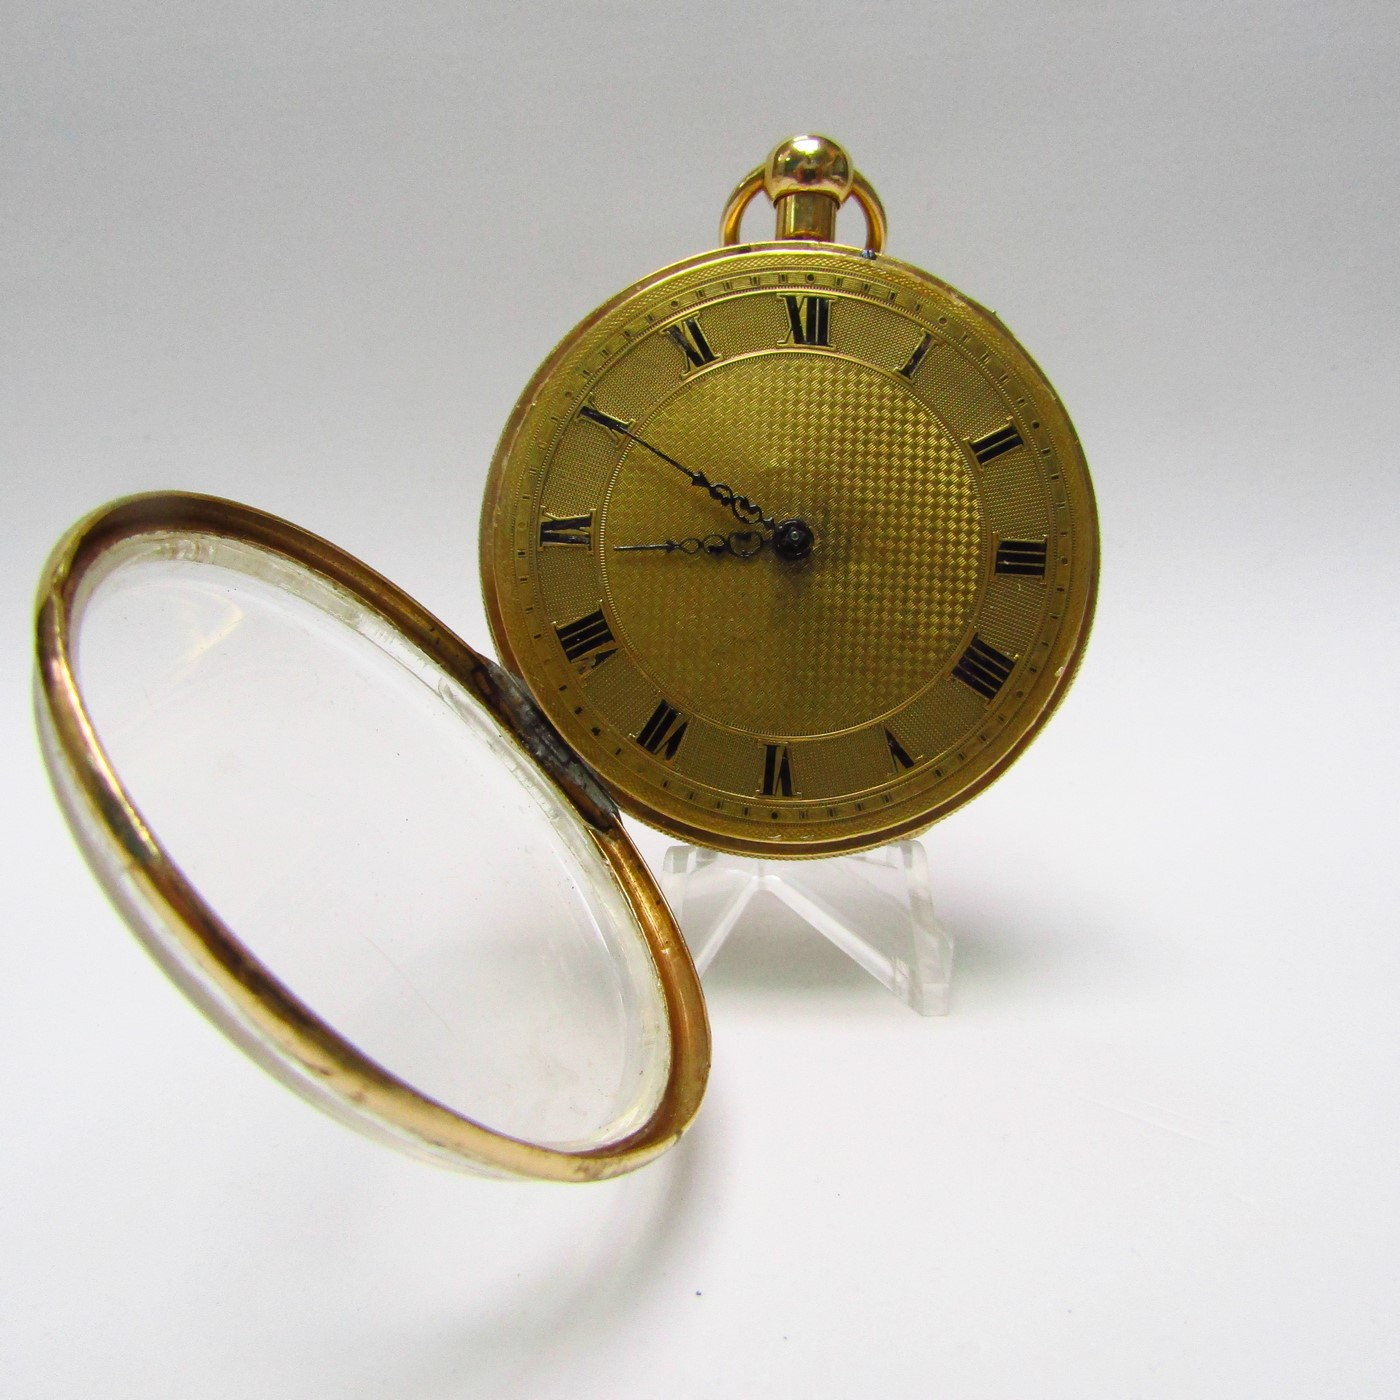 J.D. PIGUET & MEYLAN. Reloj de Bolsillo, lepine. Oro 18k. Suiza, ca. 1815.